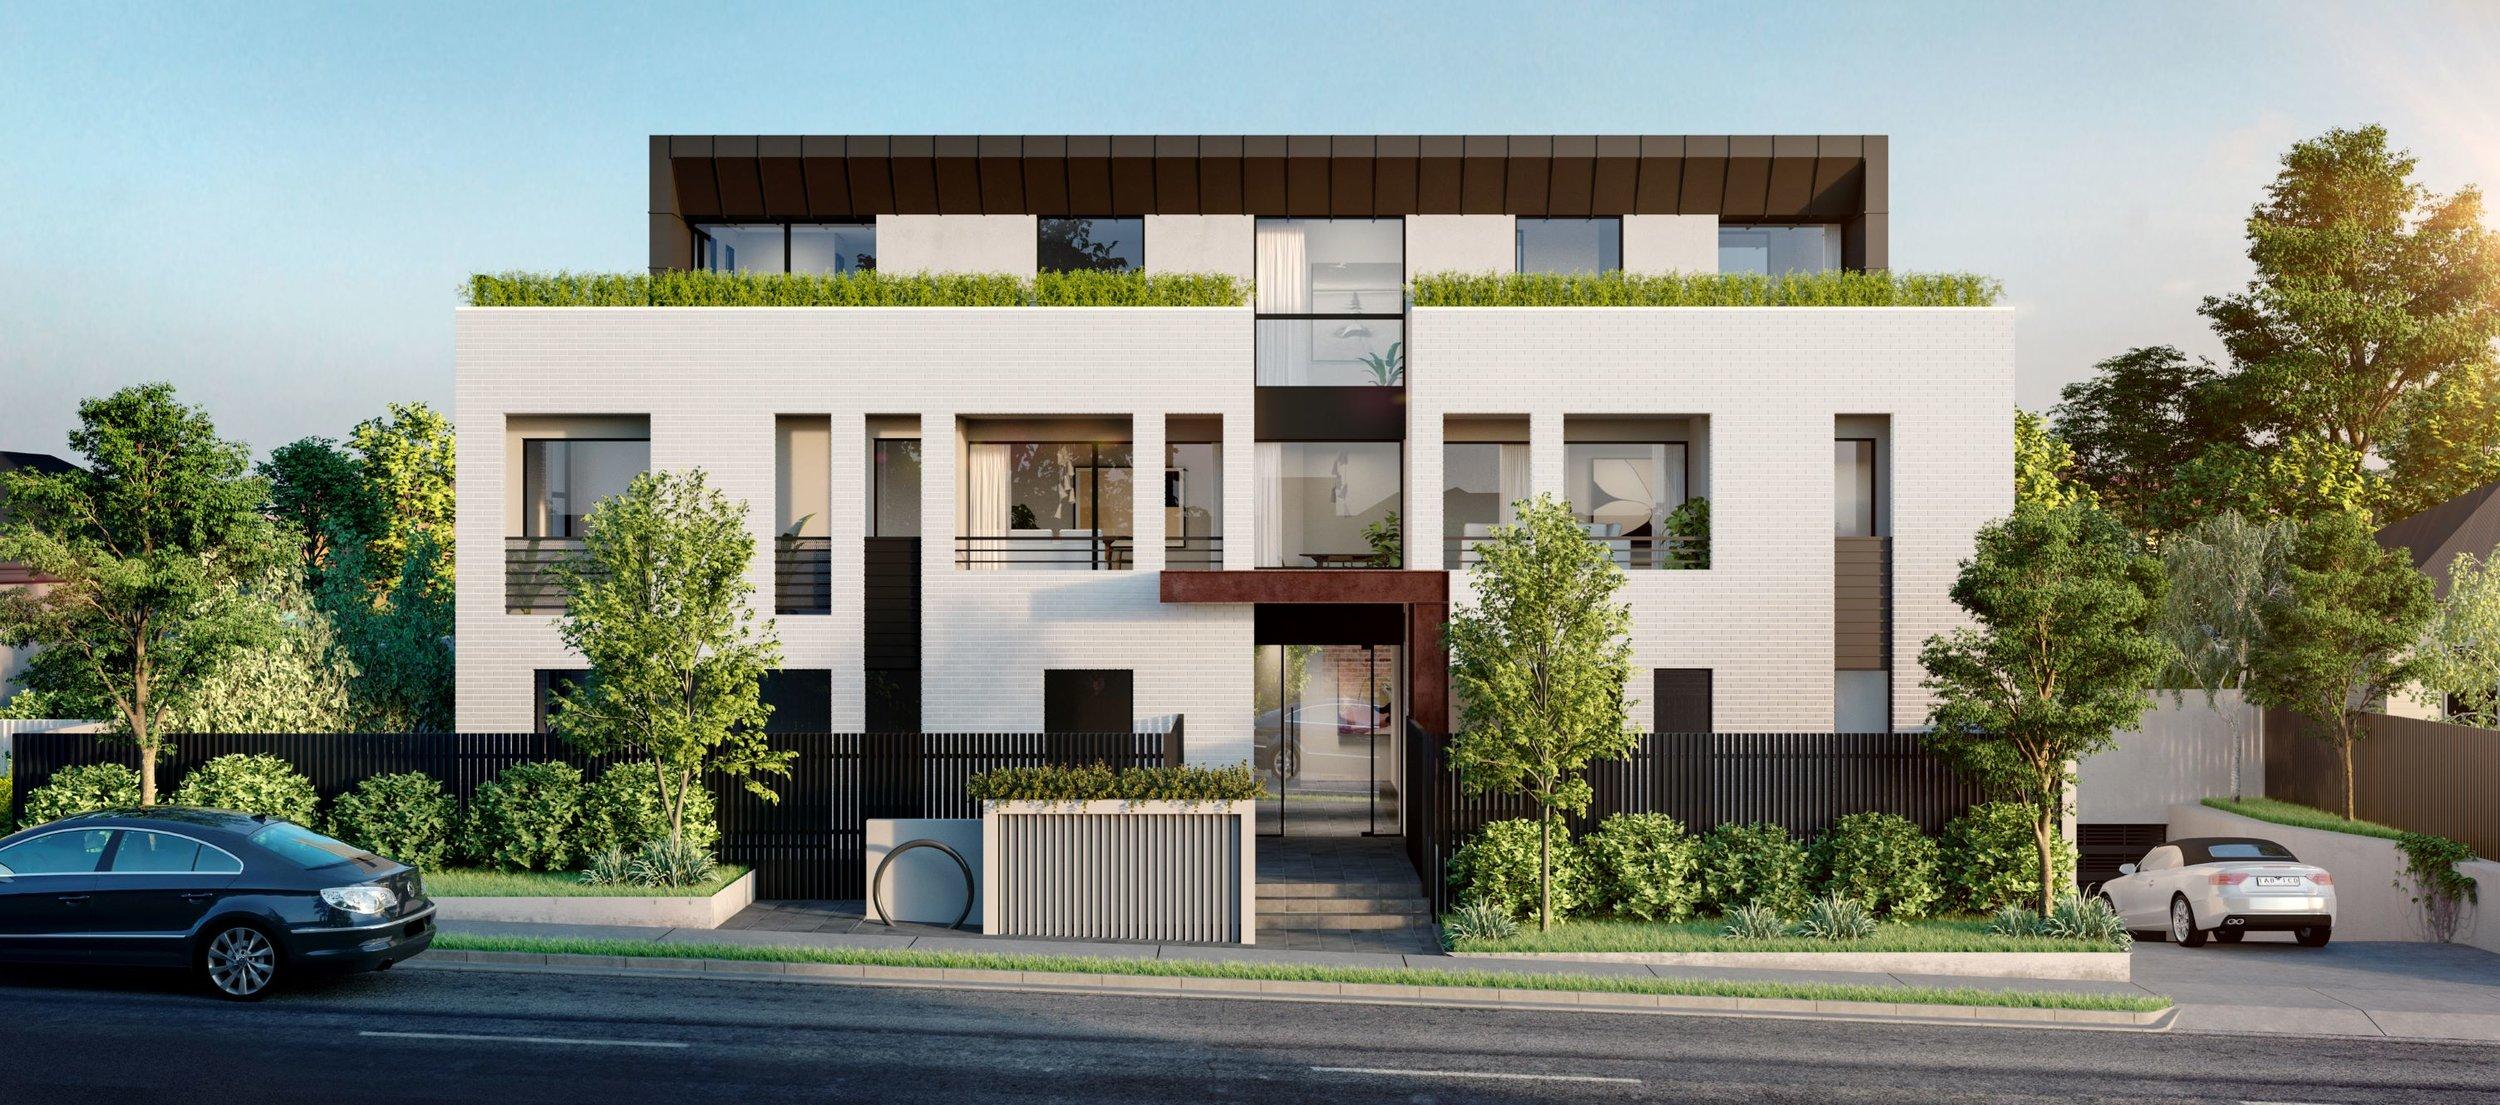 Render by Brayshaw Architects